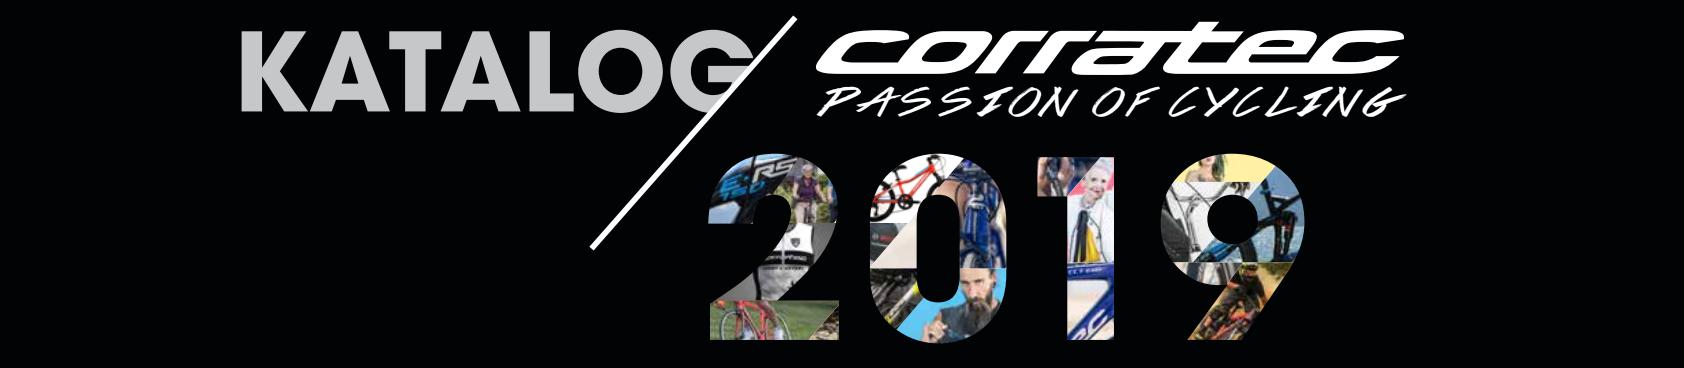 Corratec Road Bike 2019